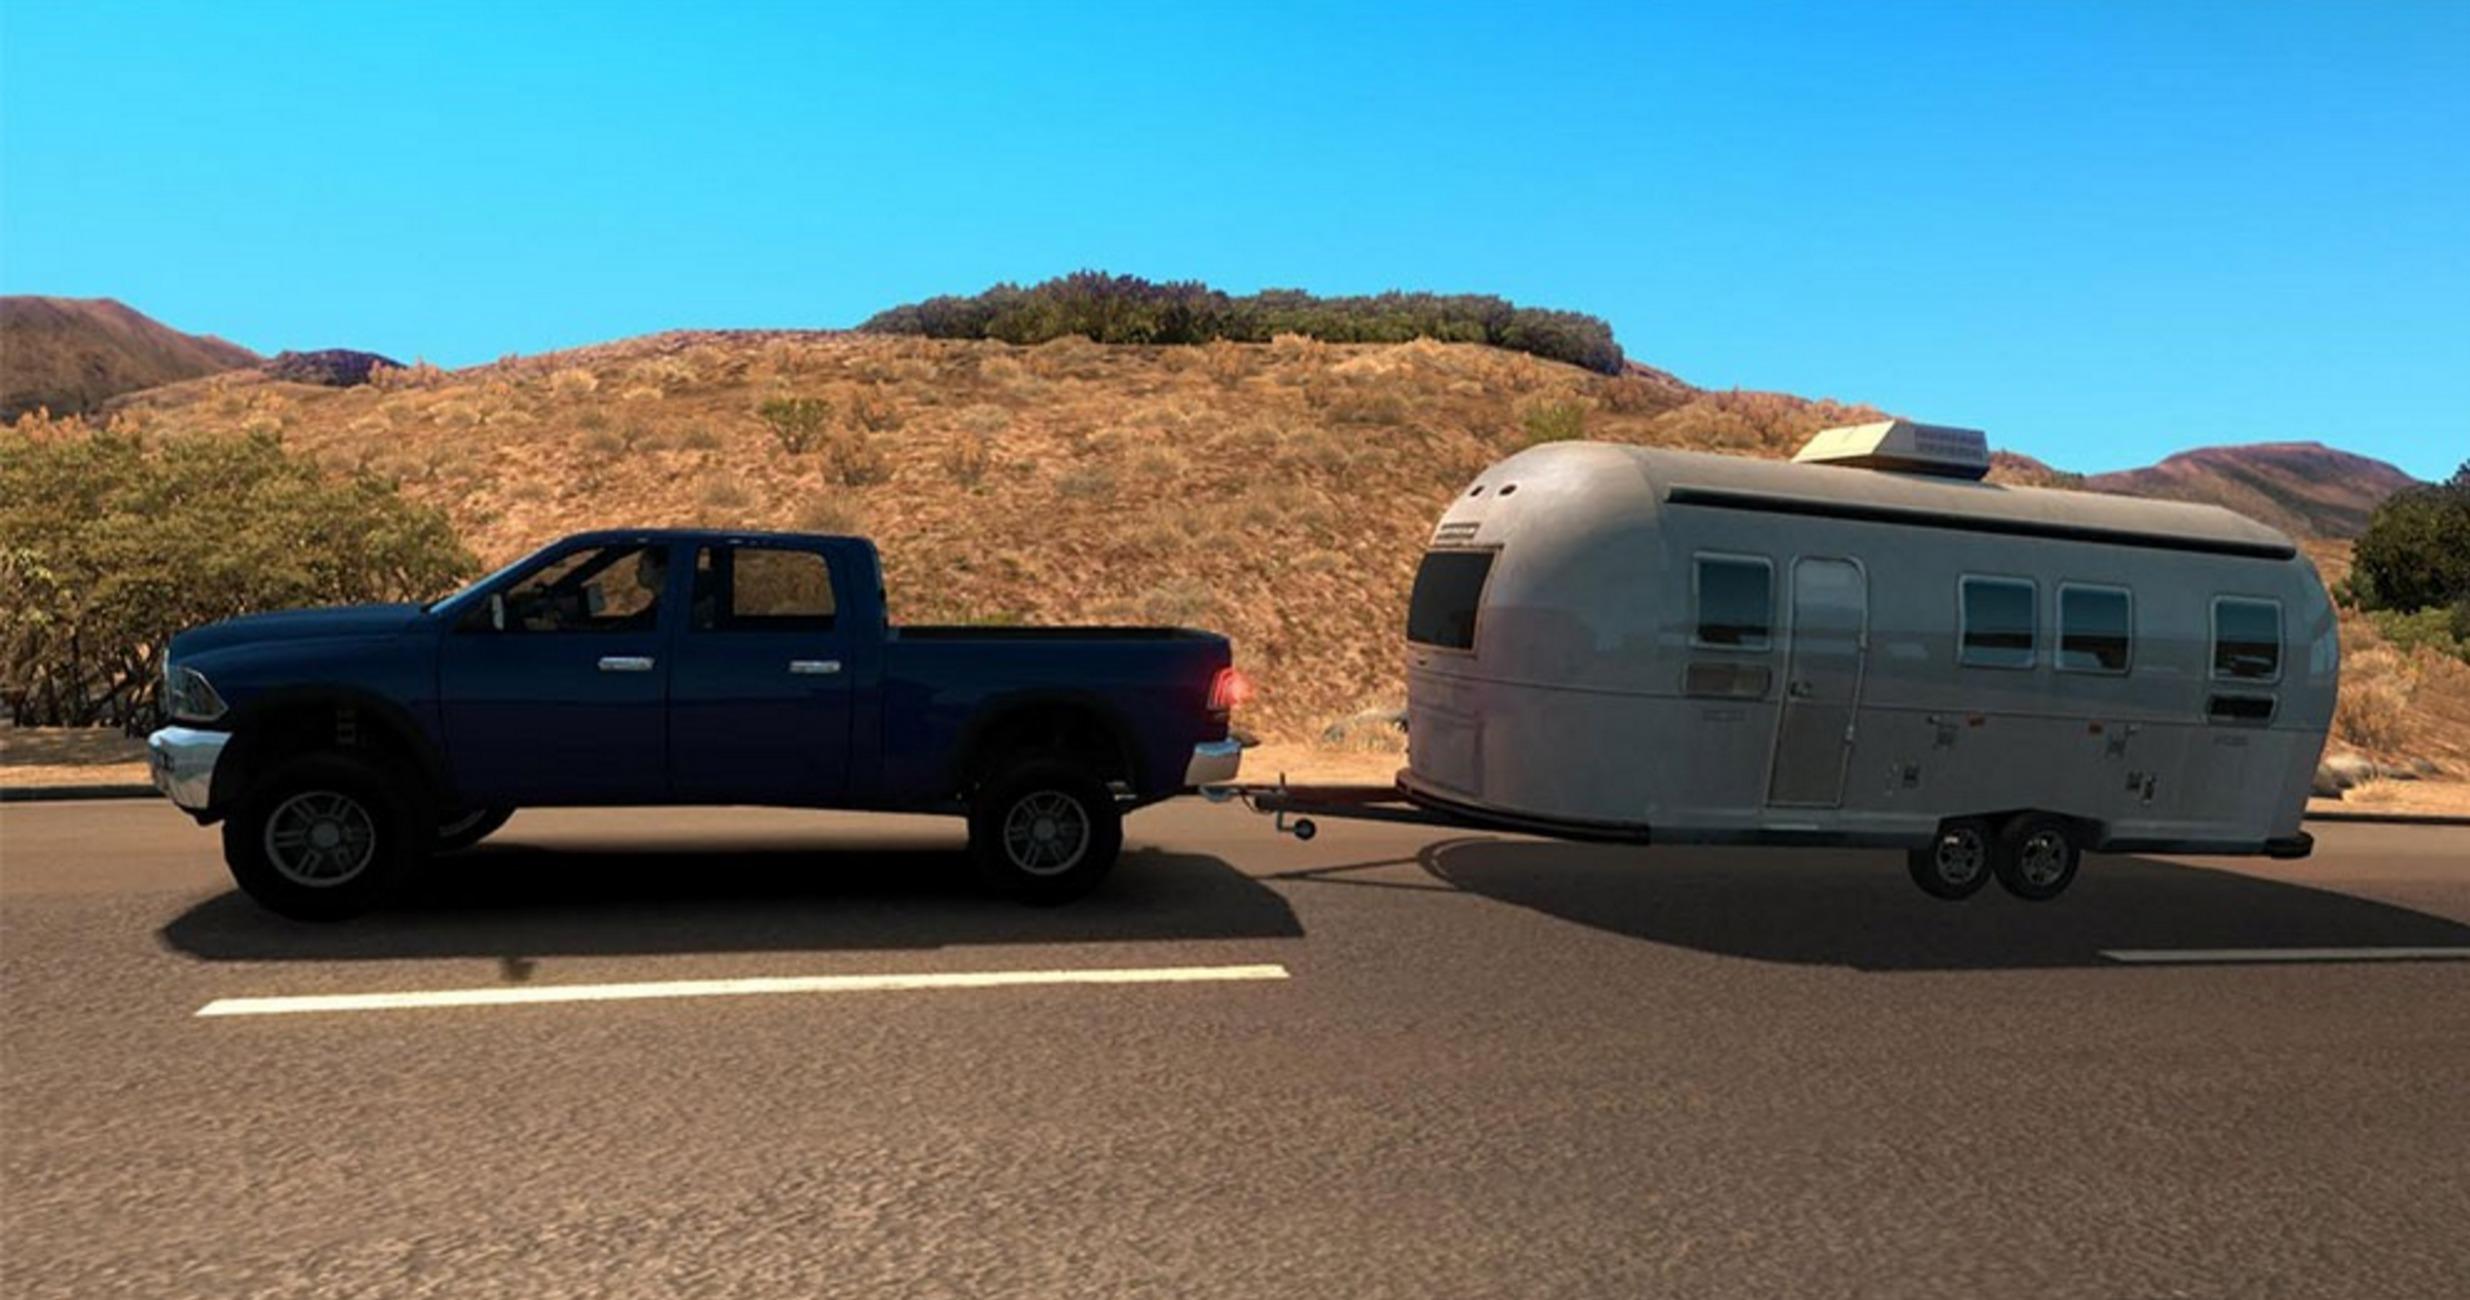 Cars with caravans a i  traffic Mod -Euro Truck Simulator 2 Mods